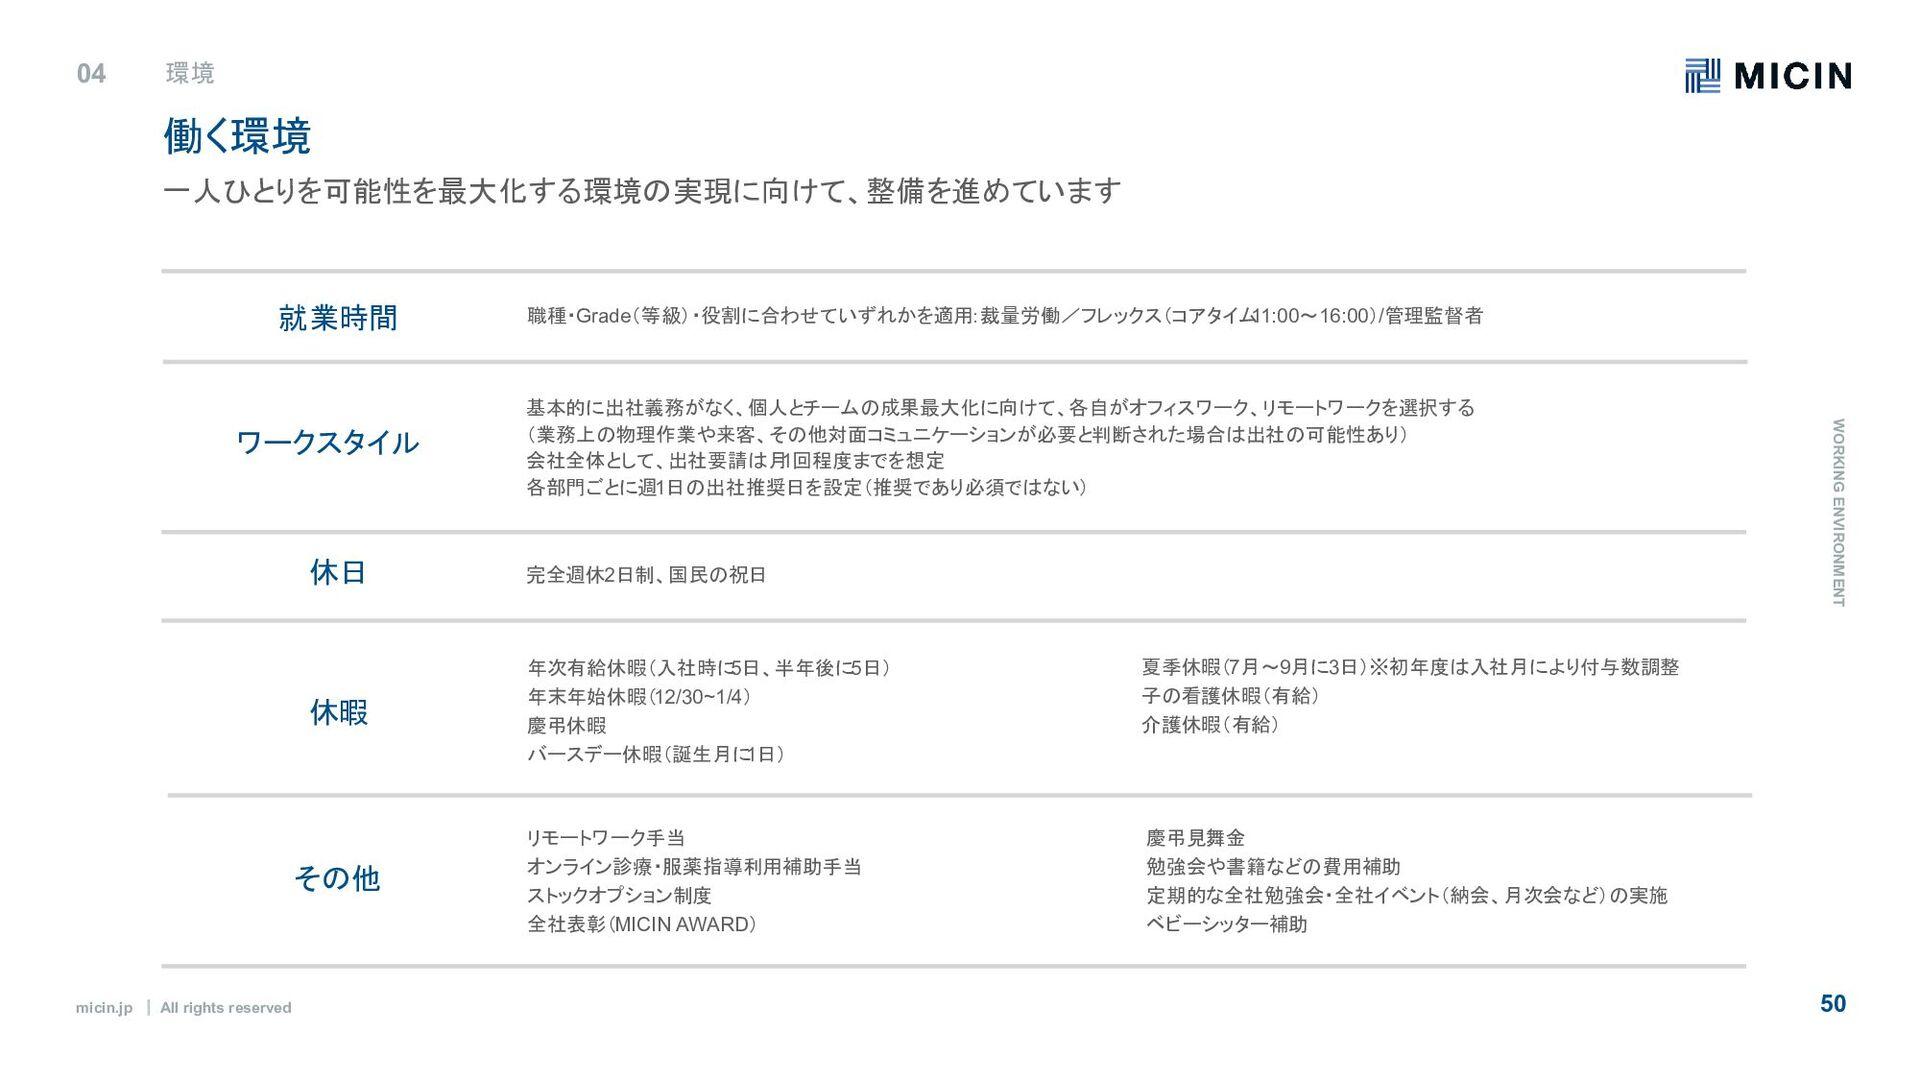 micin.jp ʛ All rights reserved 50 ࠷৽ͷ࠾༻ใɾԠื 05...